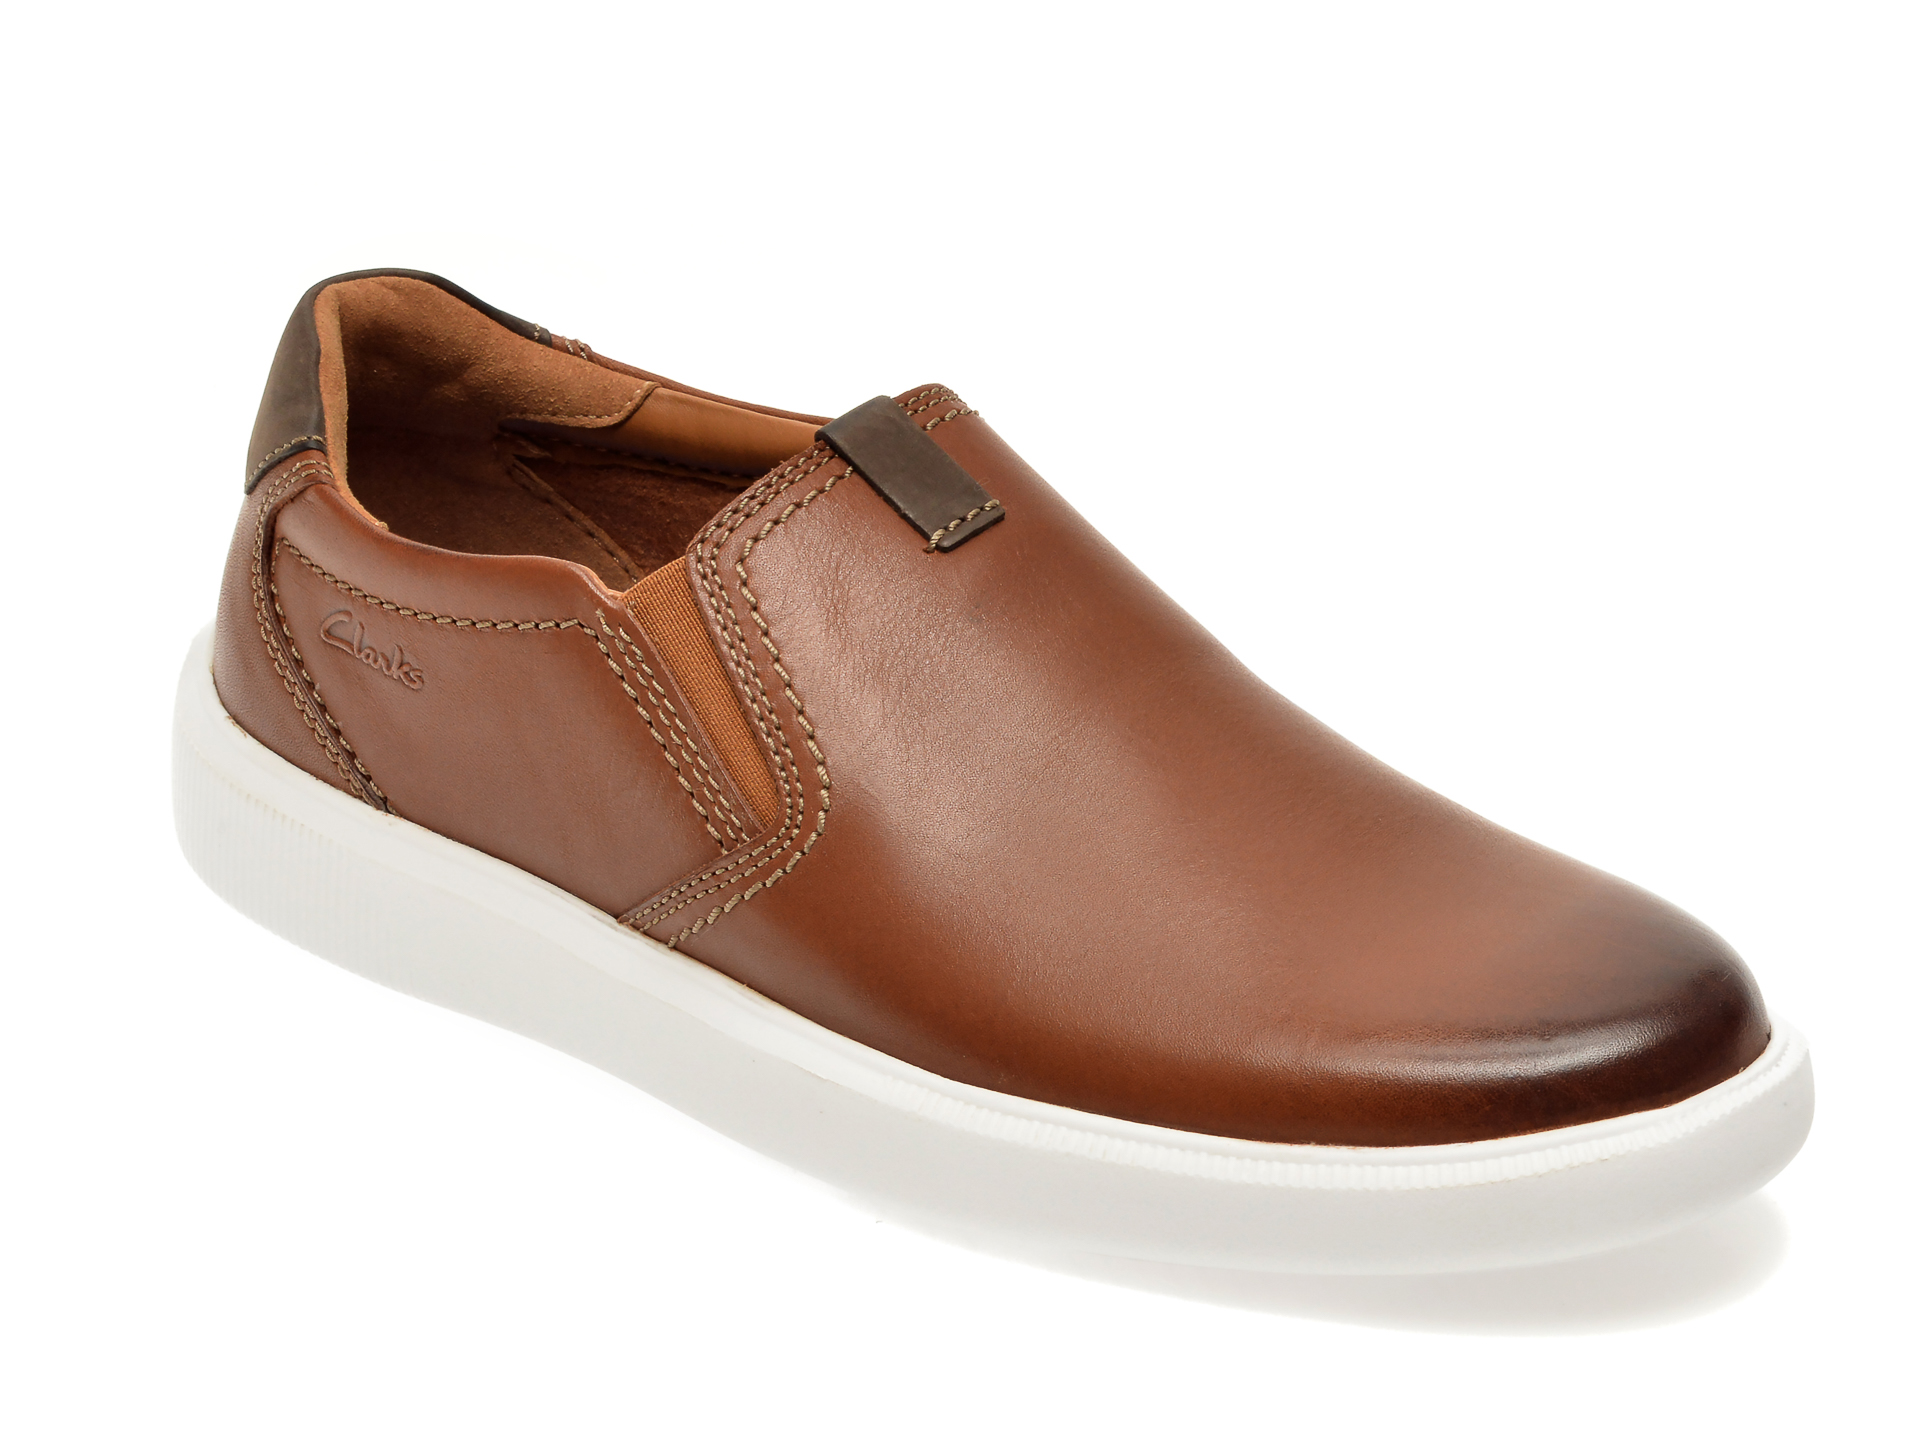 Pantofi CLARKS maro, Cambro Step, din piele naturala imagine